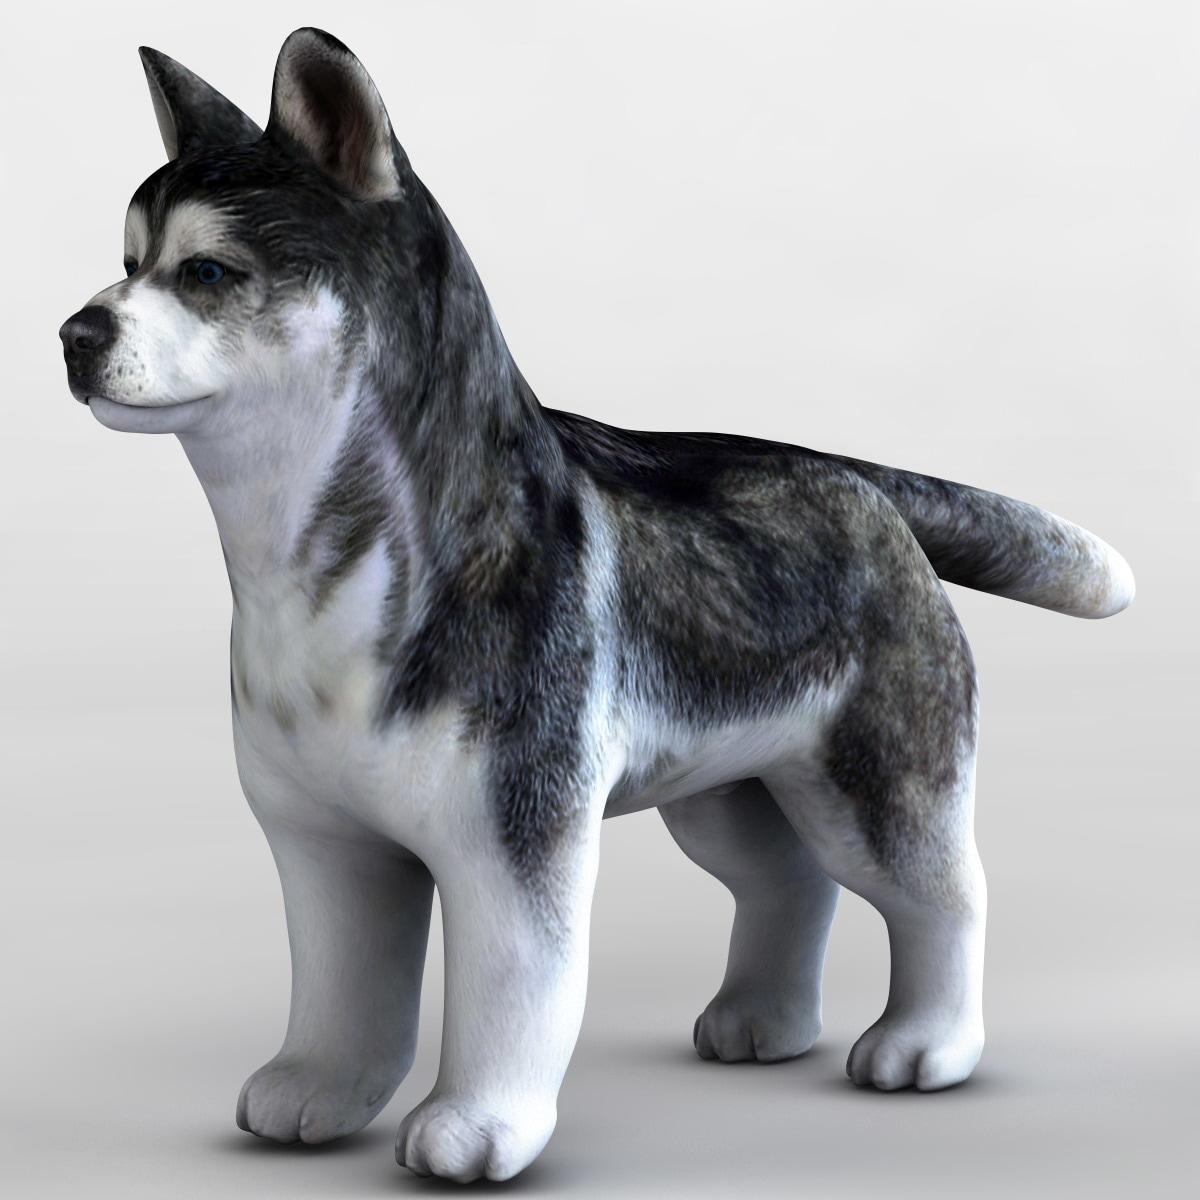 117750_Siberian_Husky_Puppie_005.jpg